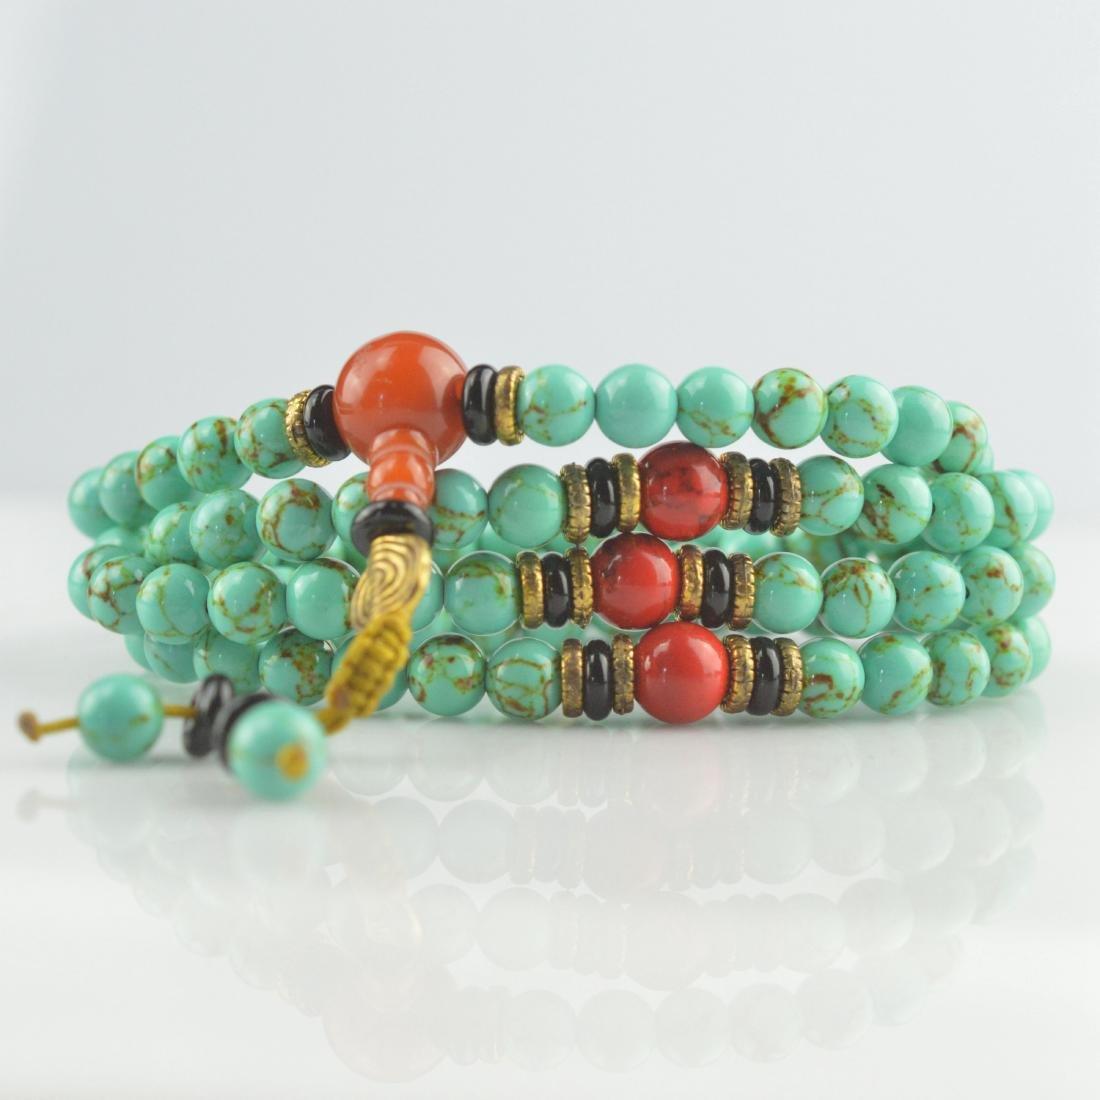 Turquoise Bead Prayer Necklace